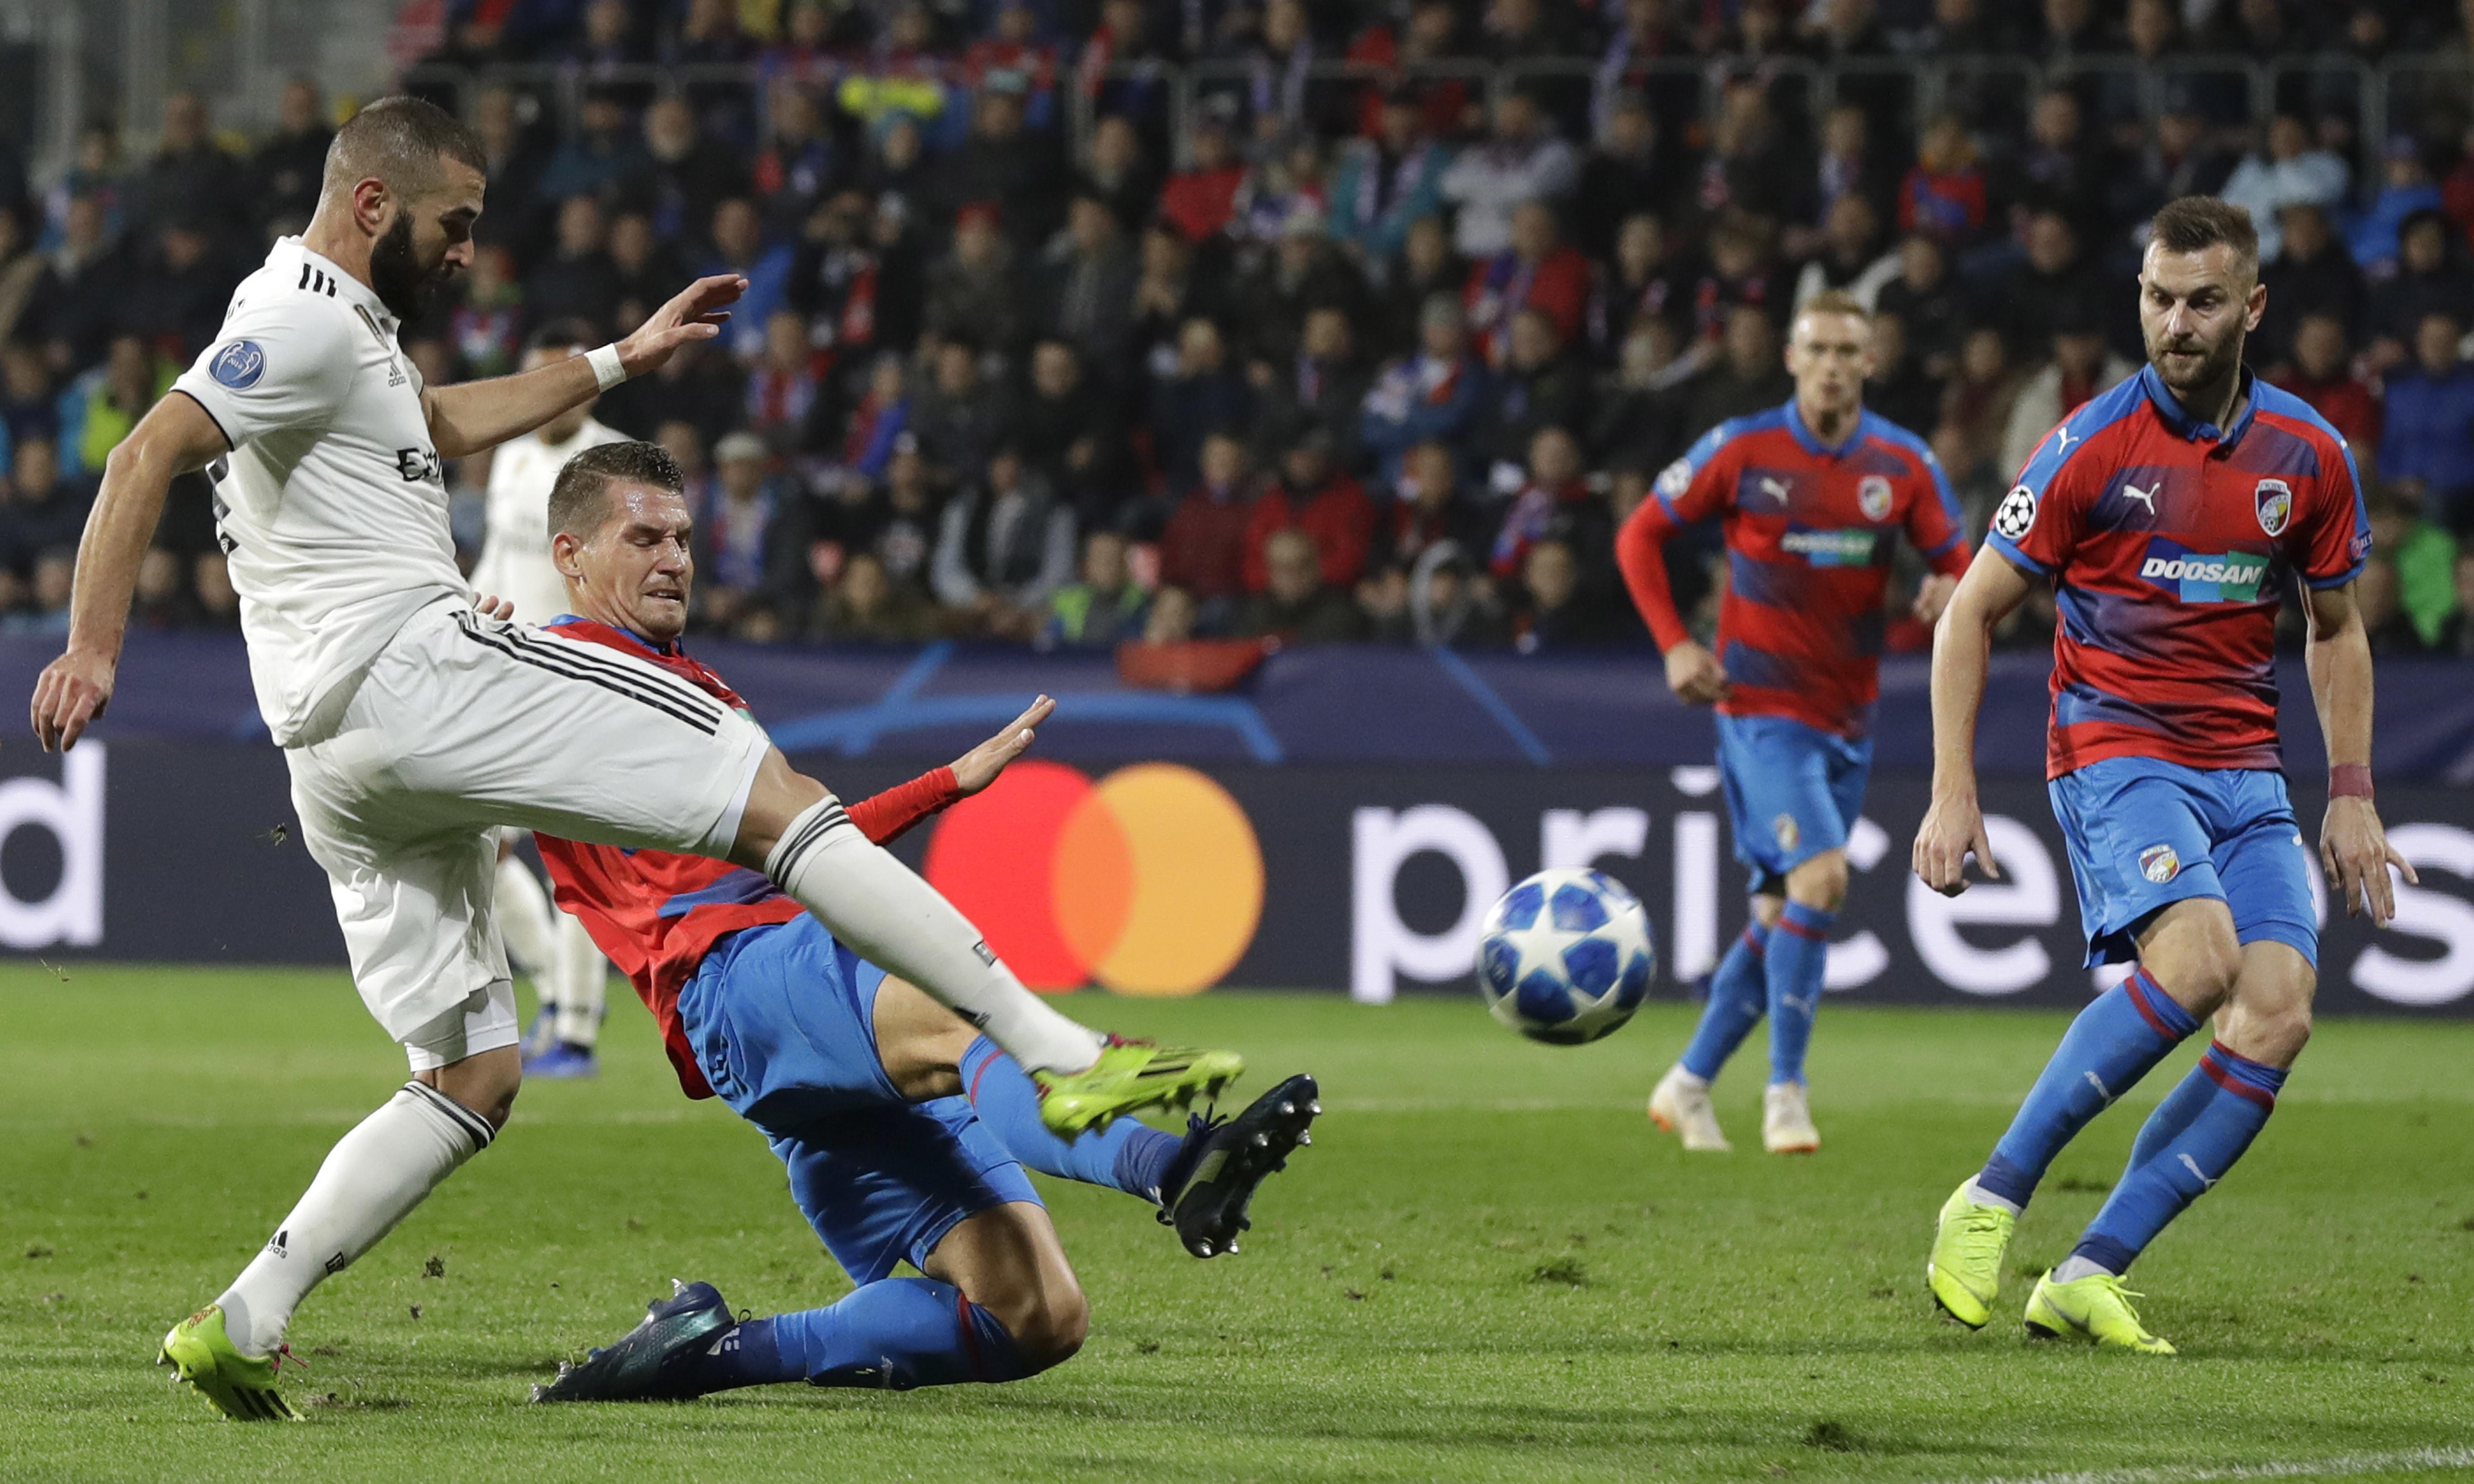 Champions League: Real Madrid thrash Plzen, 10-man Hoffenheim deny Lyon